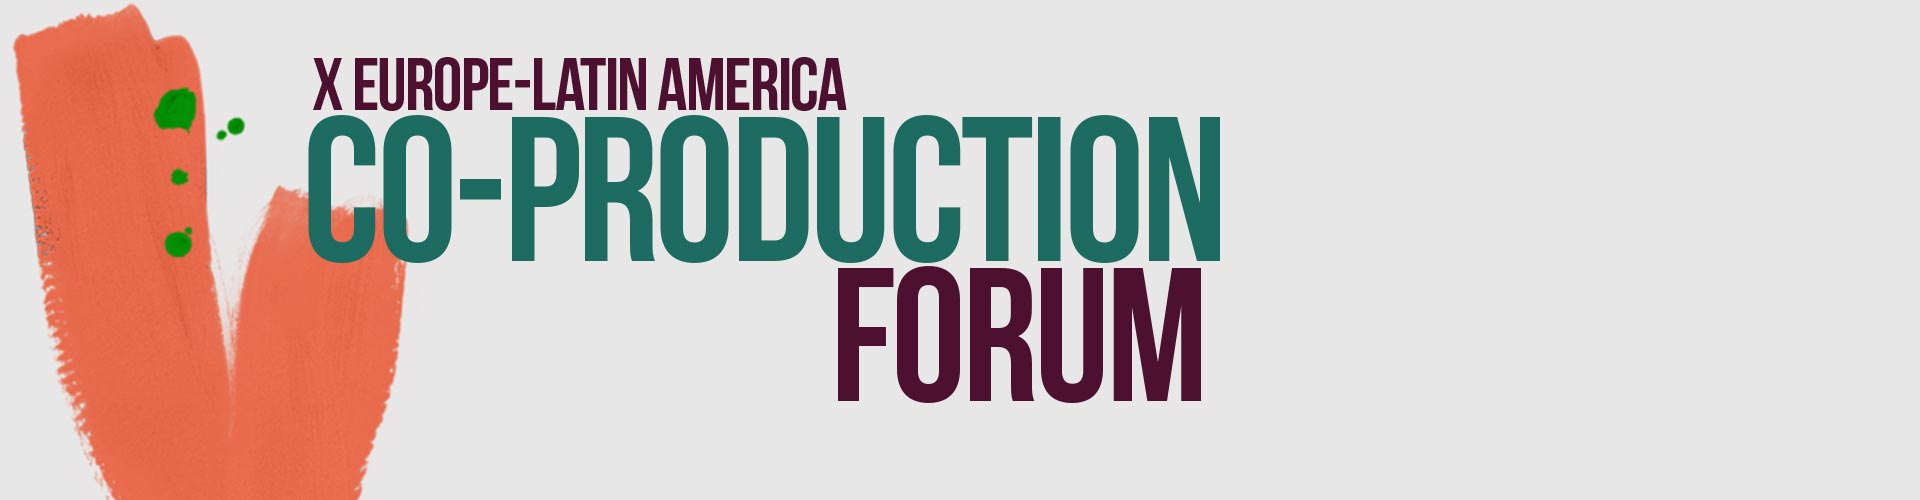 Europe-Latin America Co-Production Forum